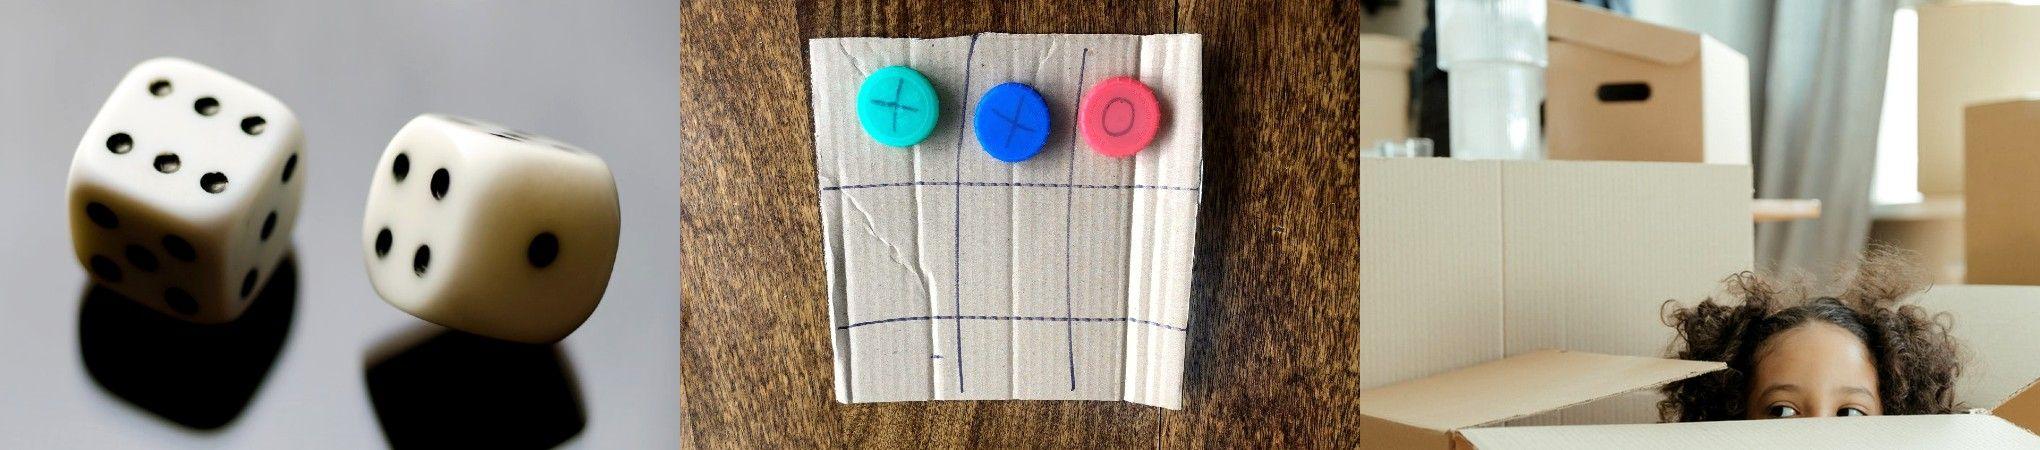 Make a simple board game